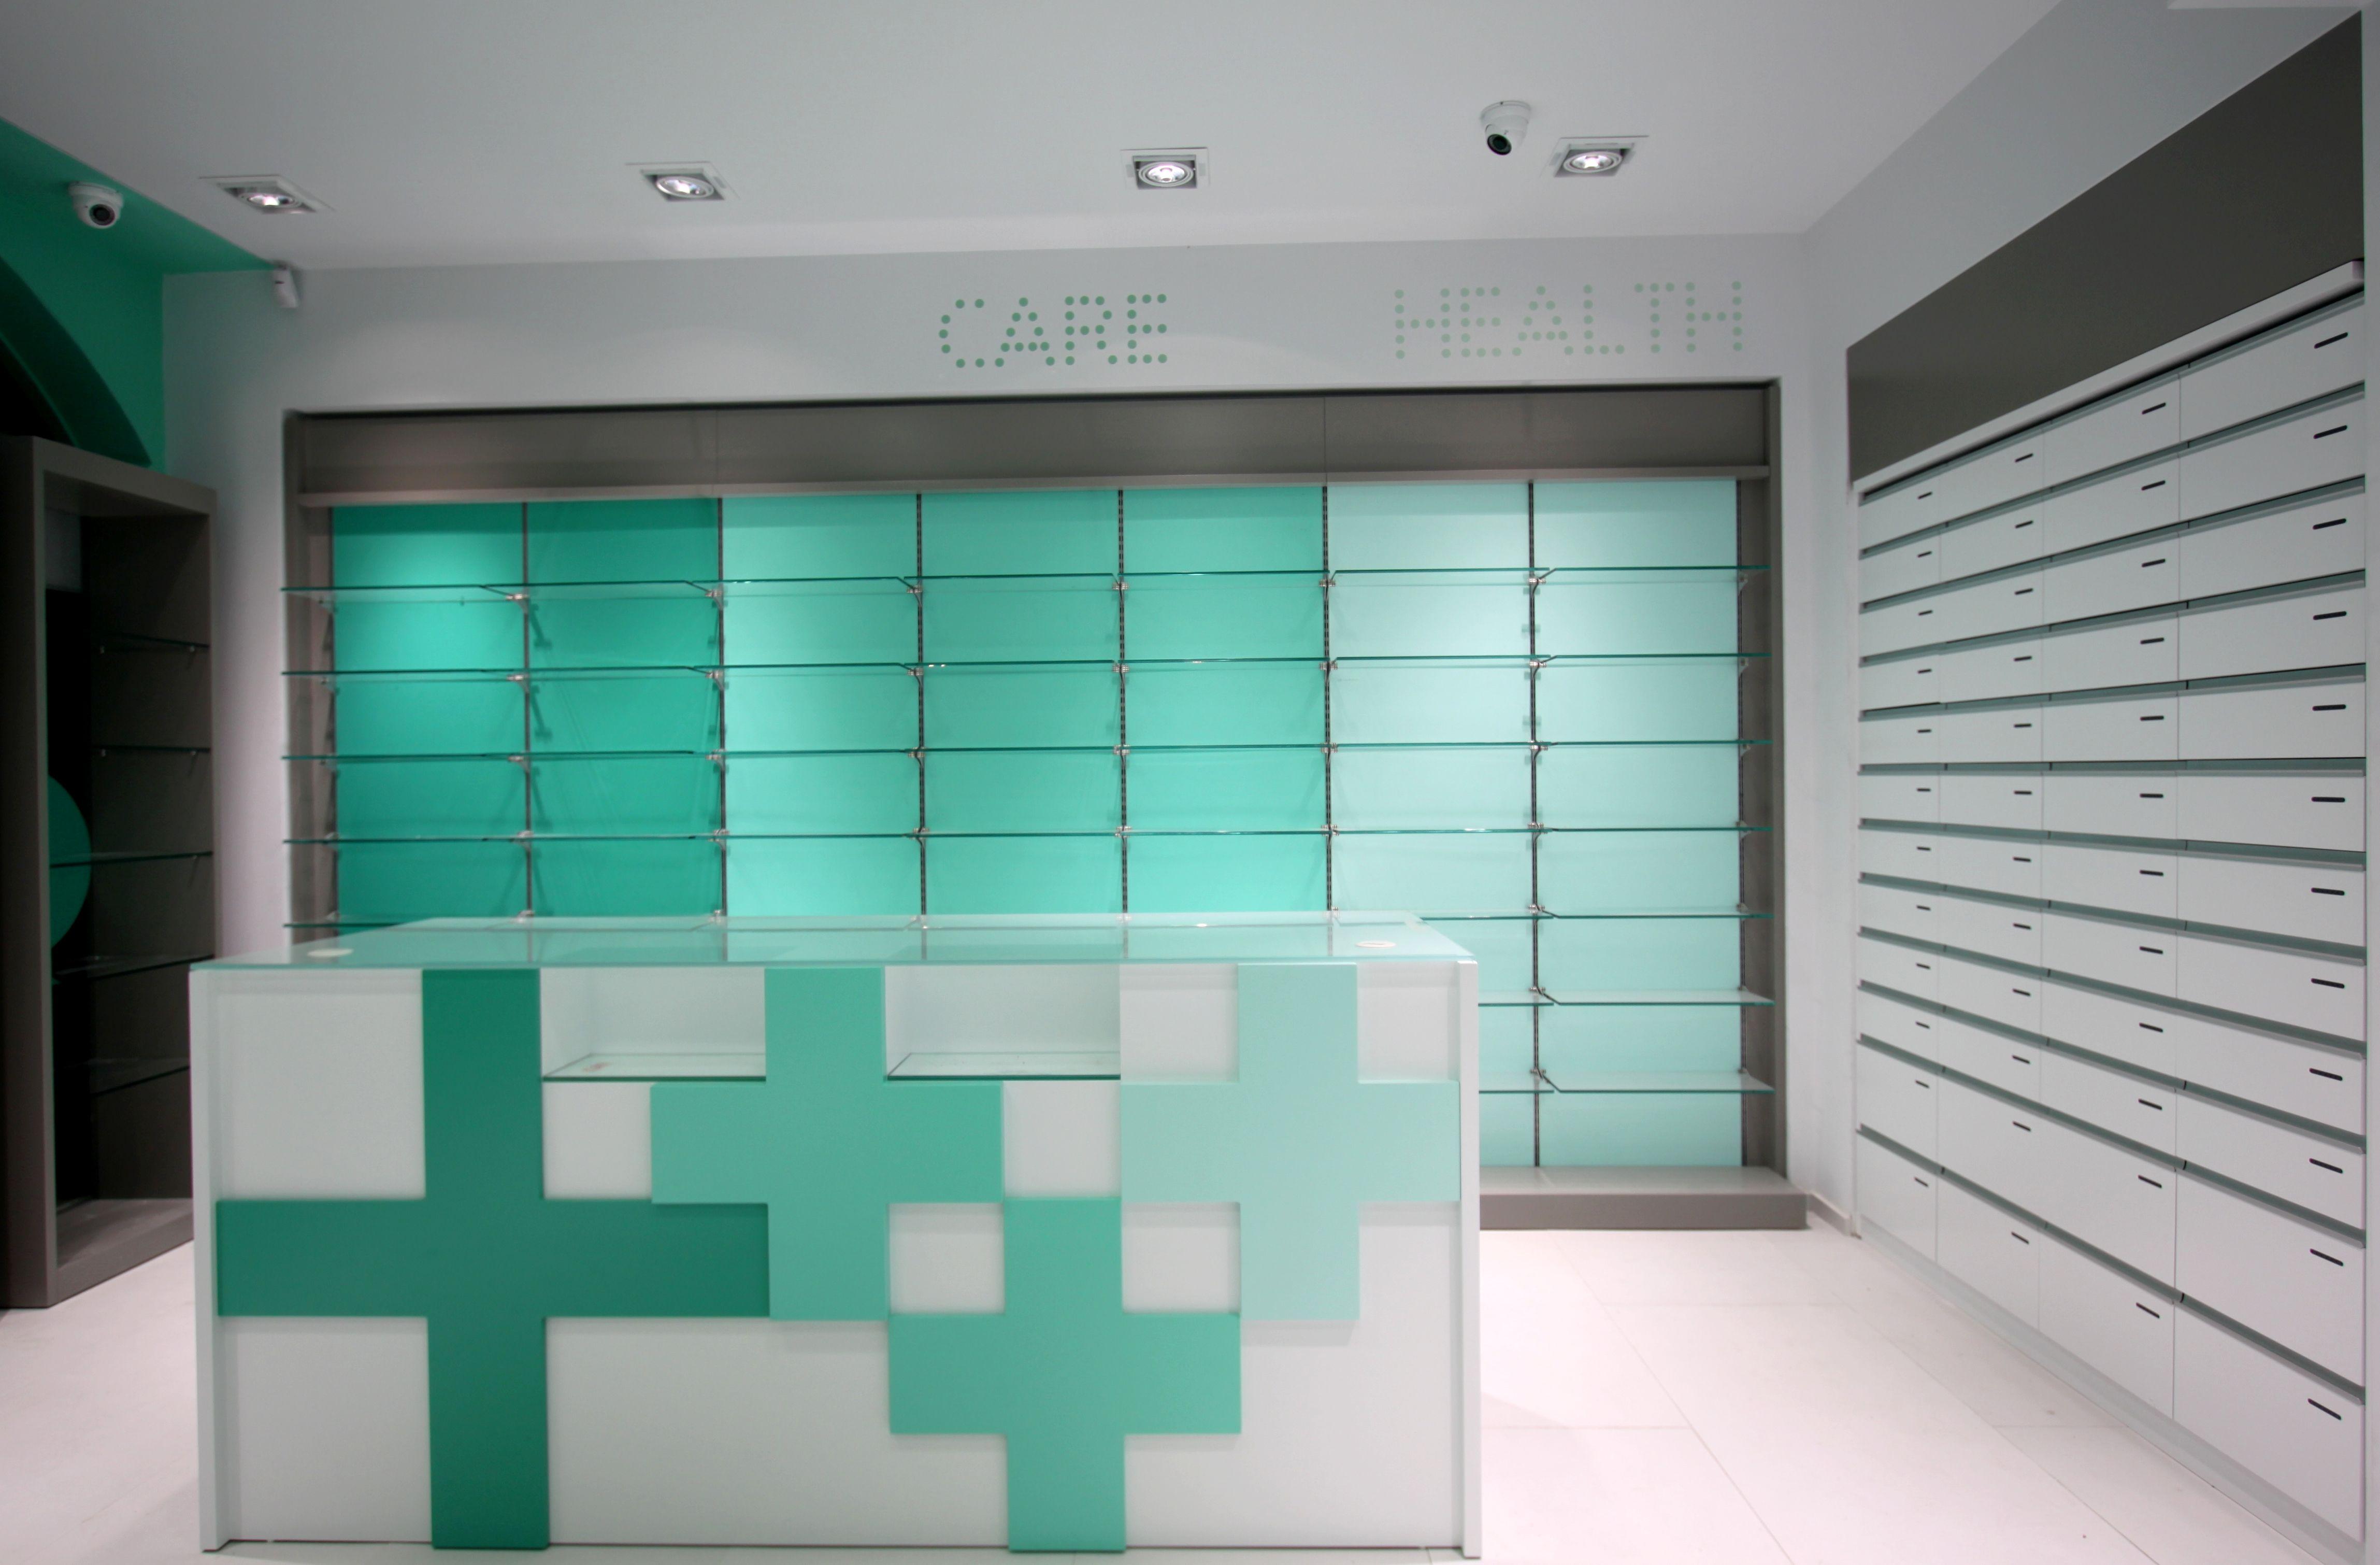 Pharmacy counter crossdesign tsoumanis pharmacy design - Commercial interior design codes ...